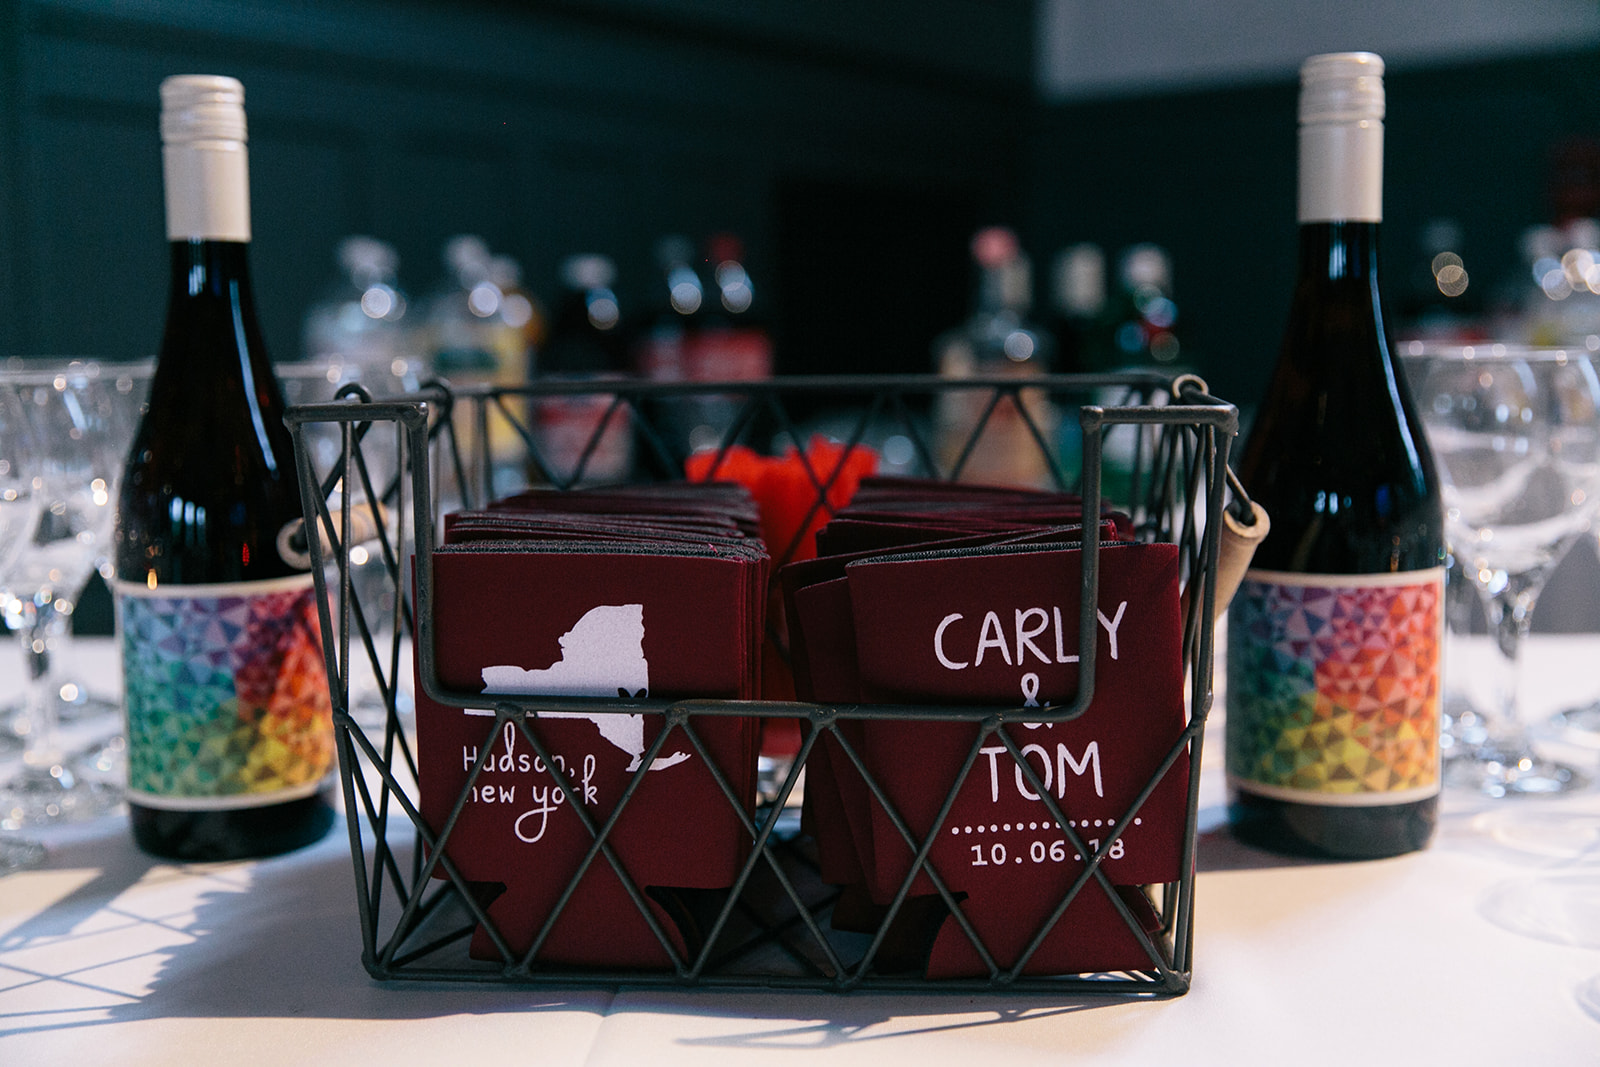 855_tom_carly_wed